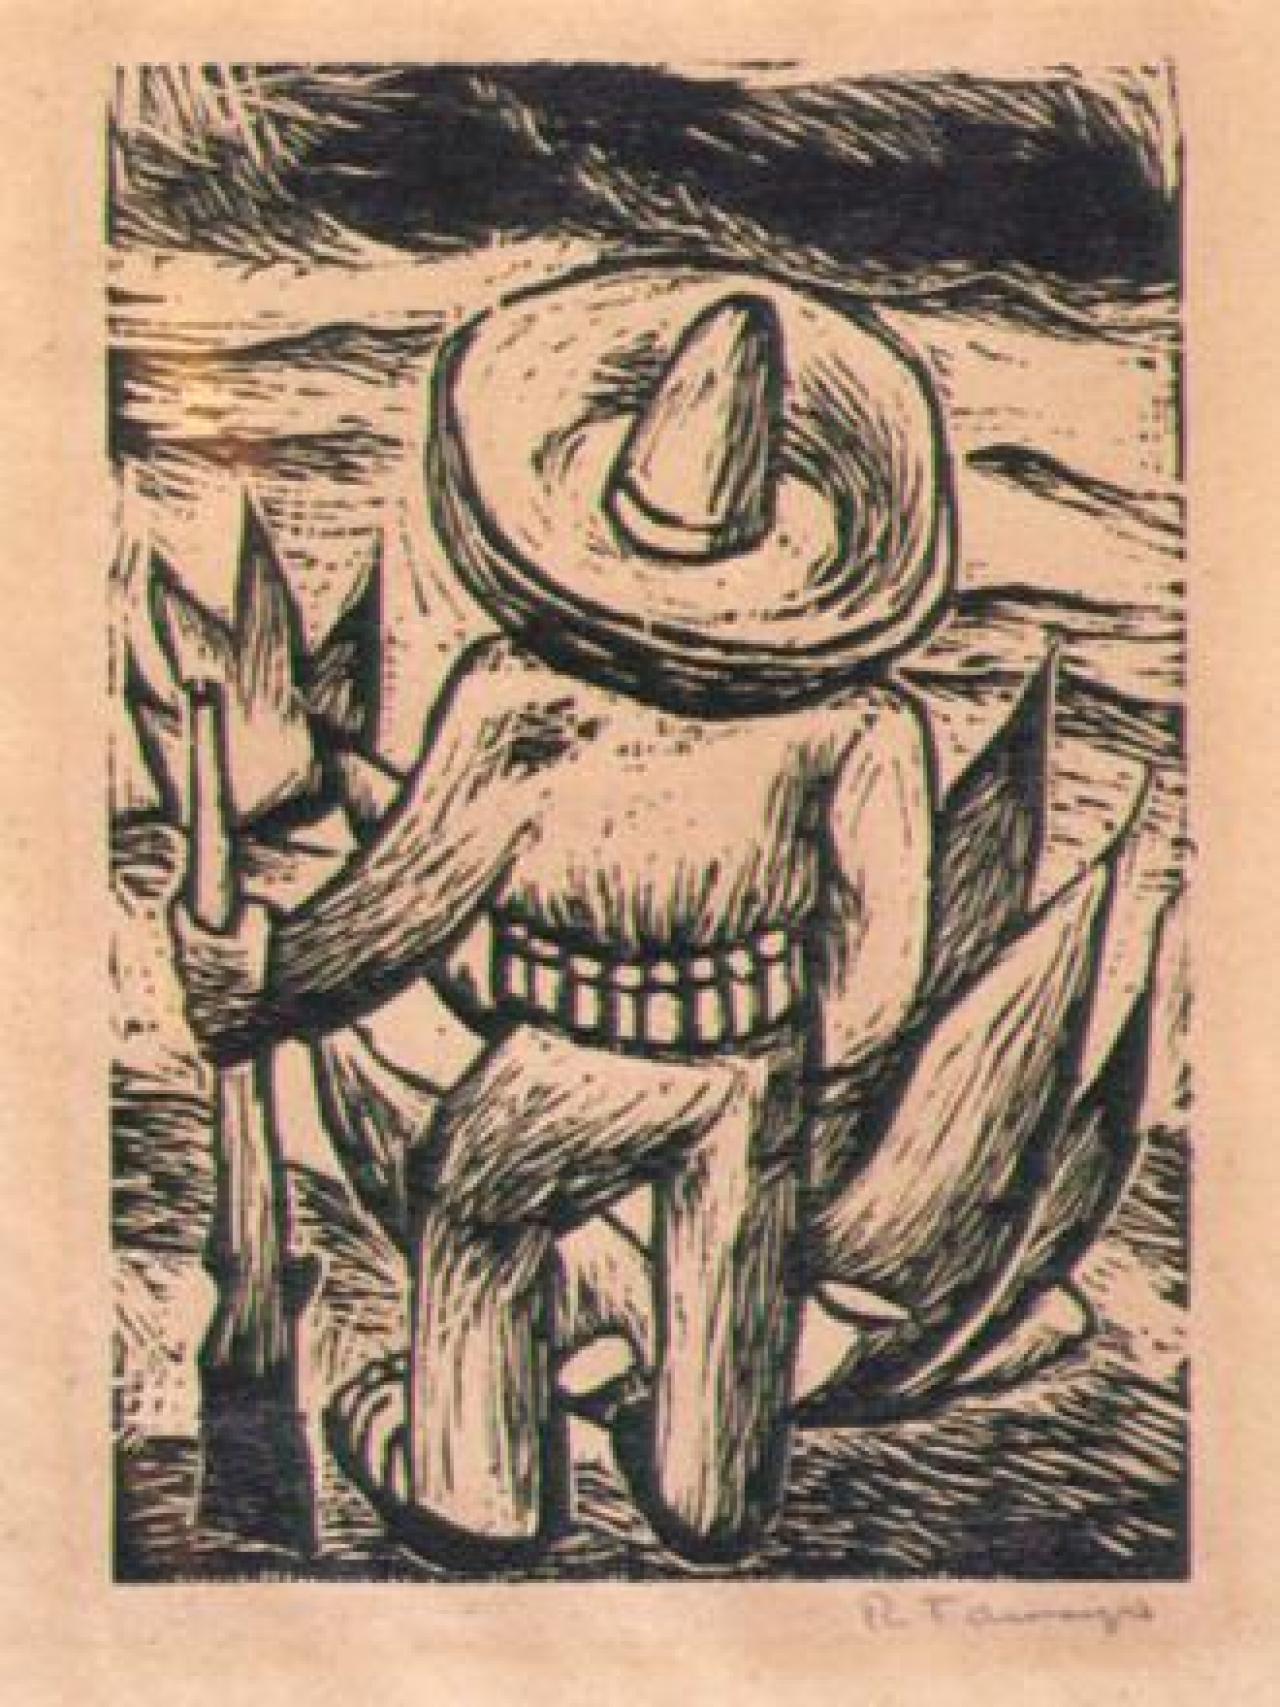 Obra grfica de Rufino Tamayo  Lifestyle de